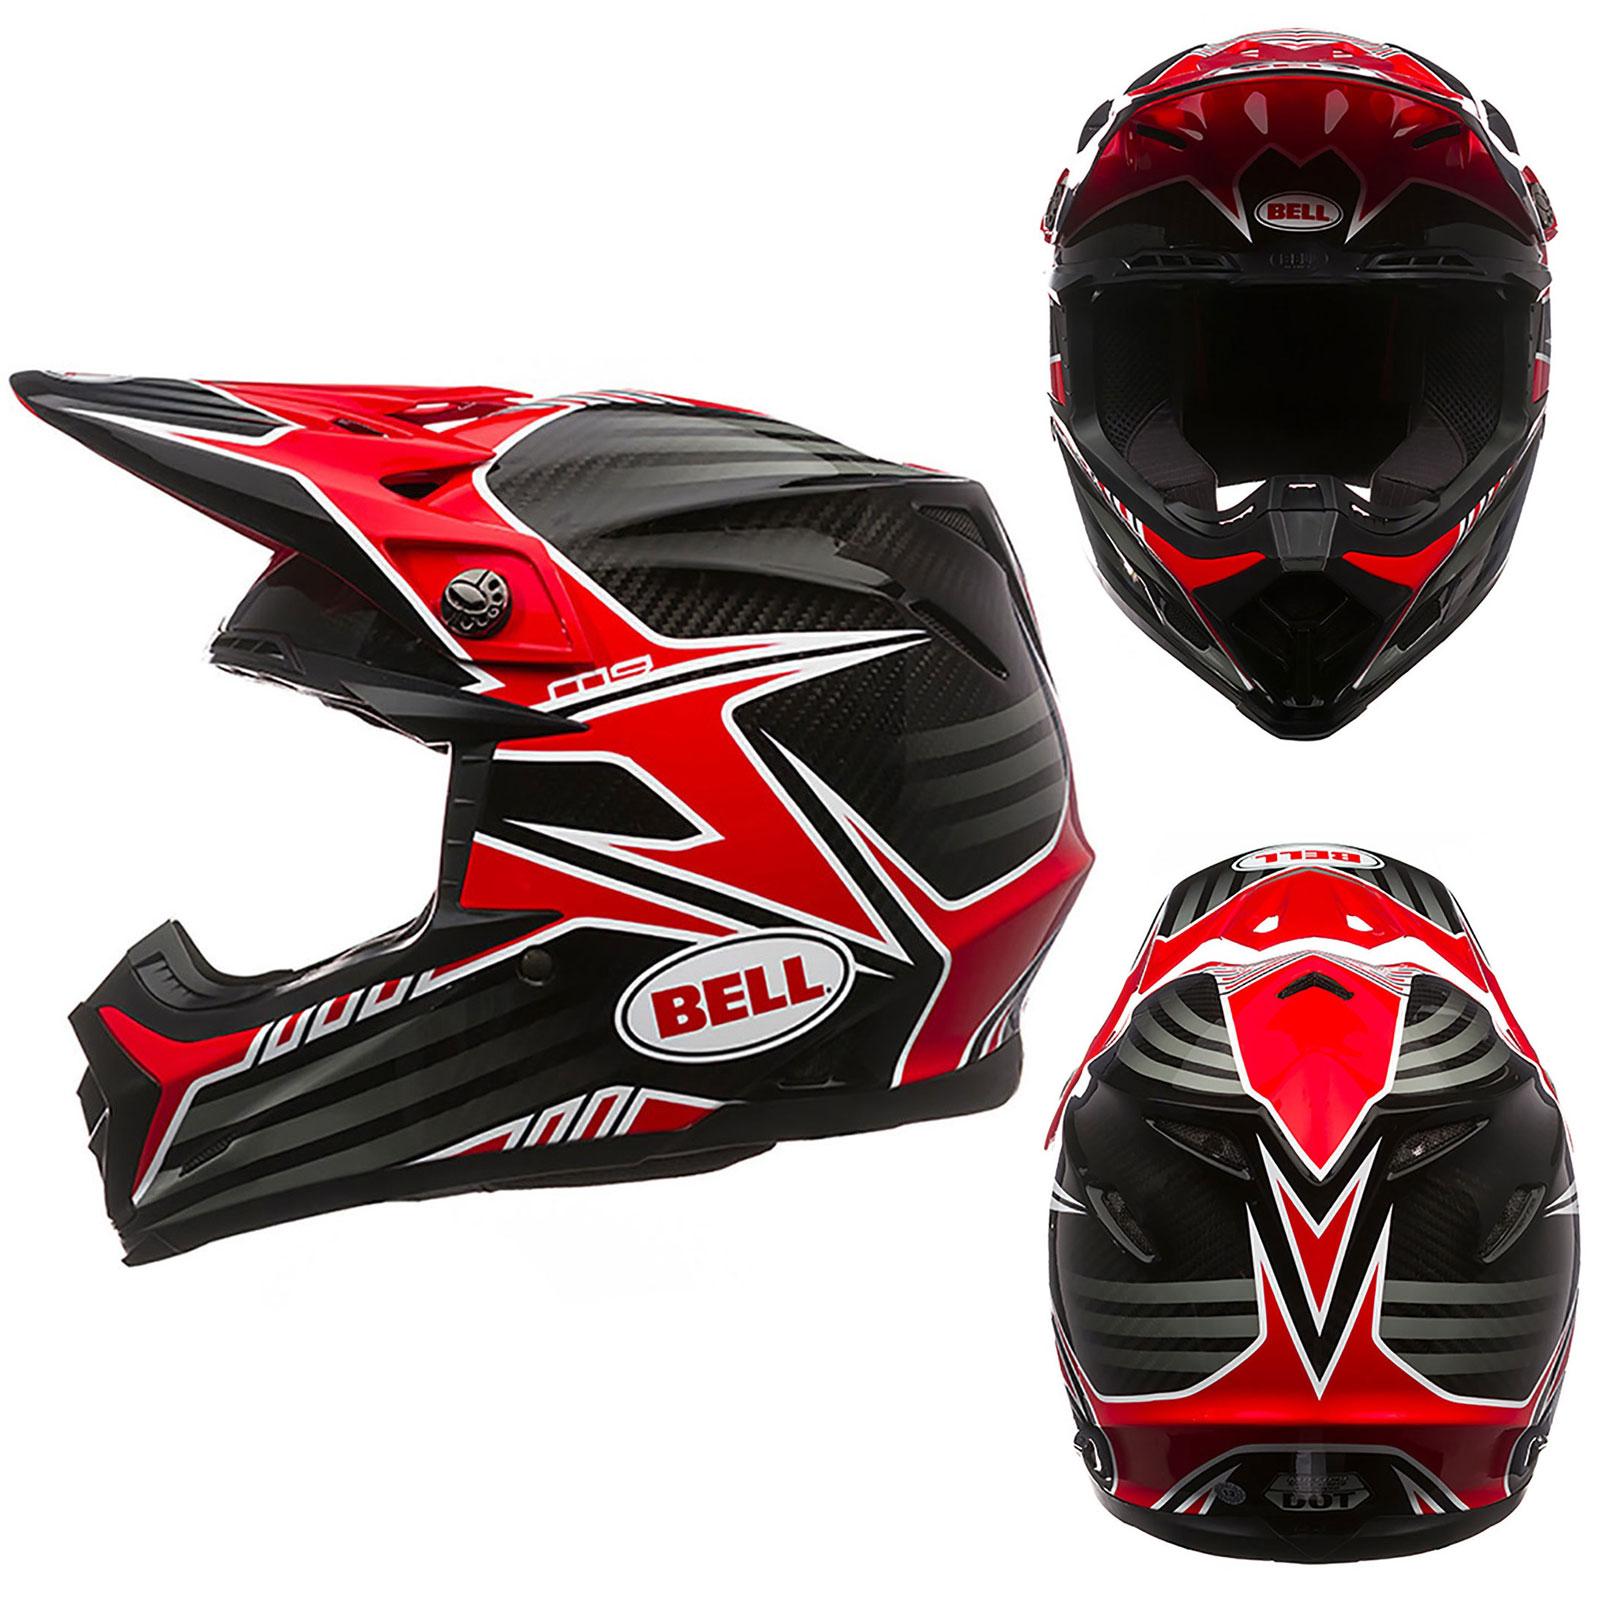 bell moto 9 carbon pinned tagger clash motocross mx enduro offroad helmet red ebay. Black Bedroom Furniture Sets. Home Design Ideas